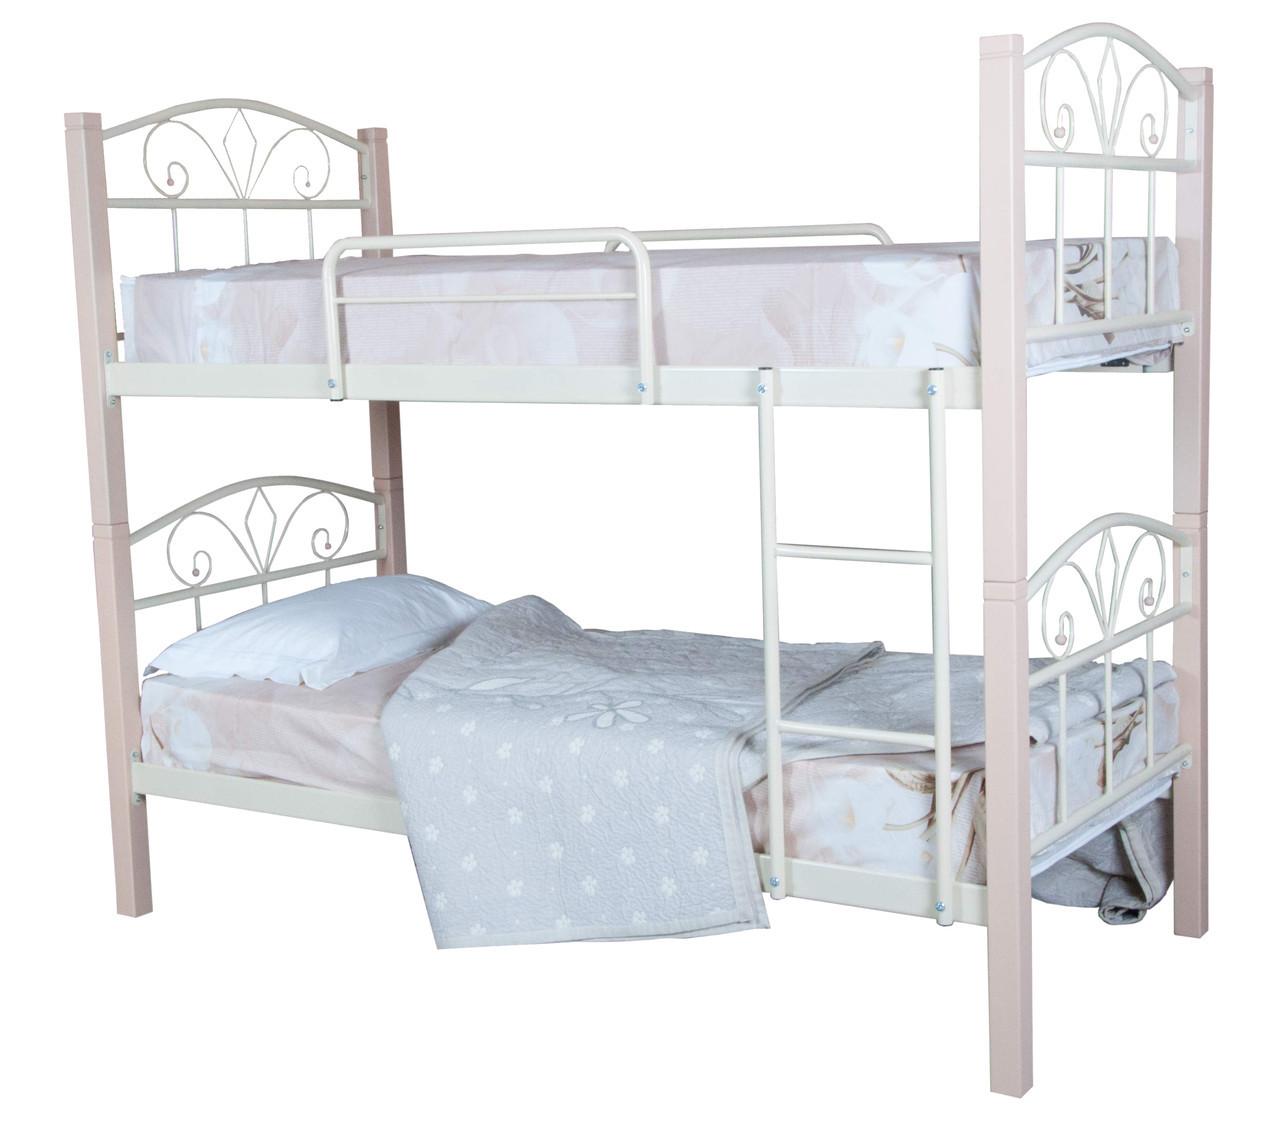 Кровать Лара Люкс Вуд двухъярусная  190х90, коричневая